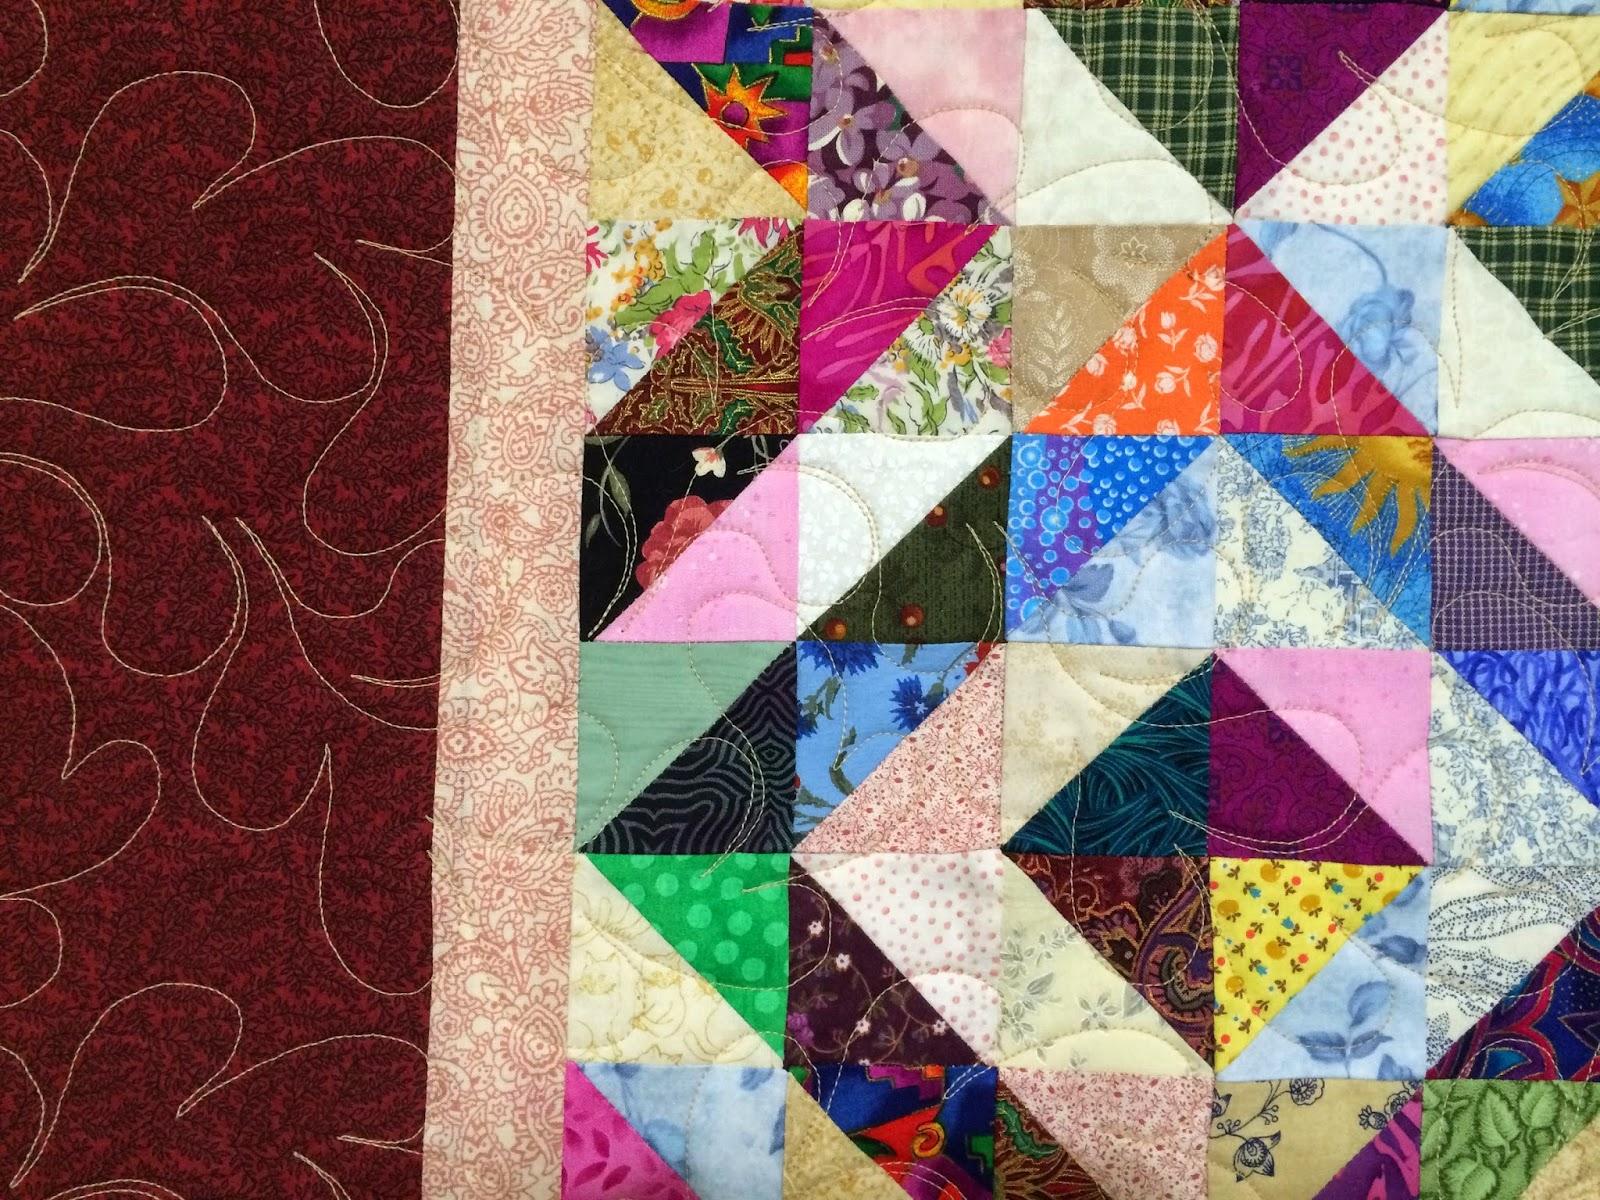 Joty Majka's Multi-color Diamonds on Point Quilt